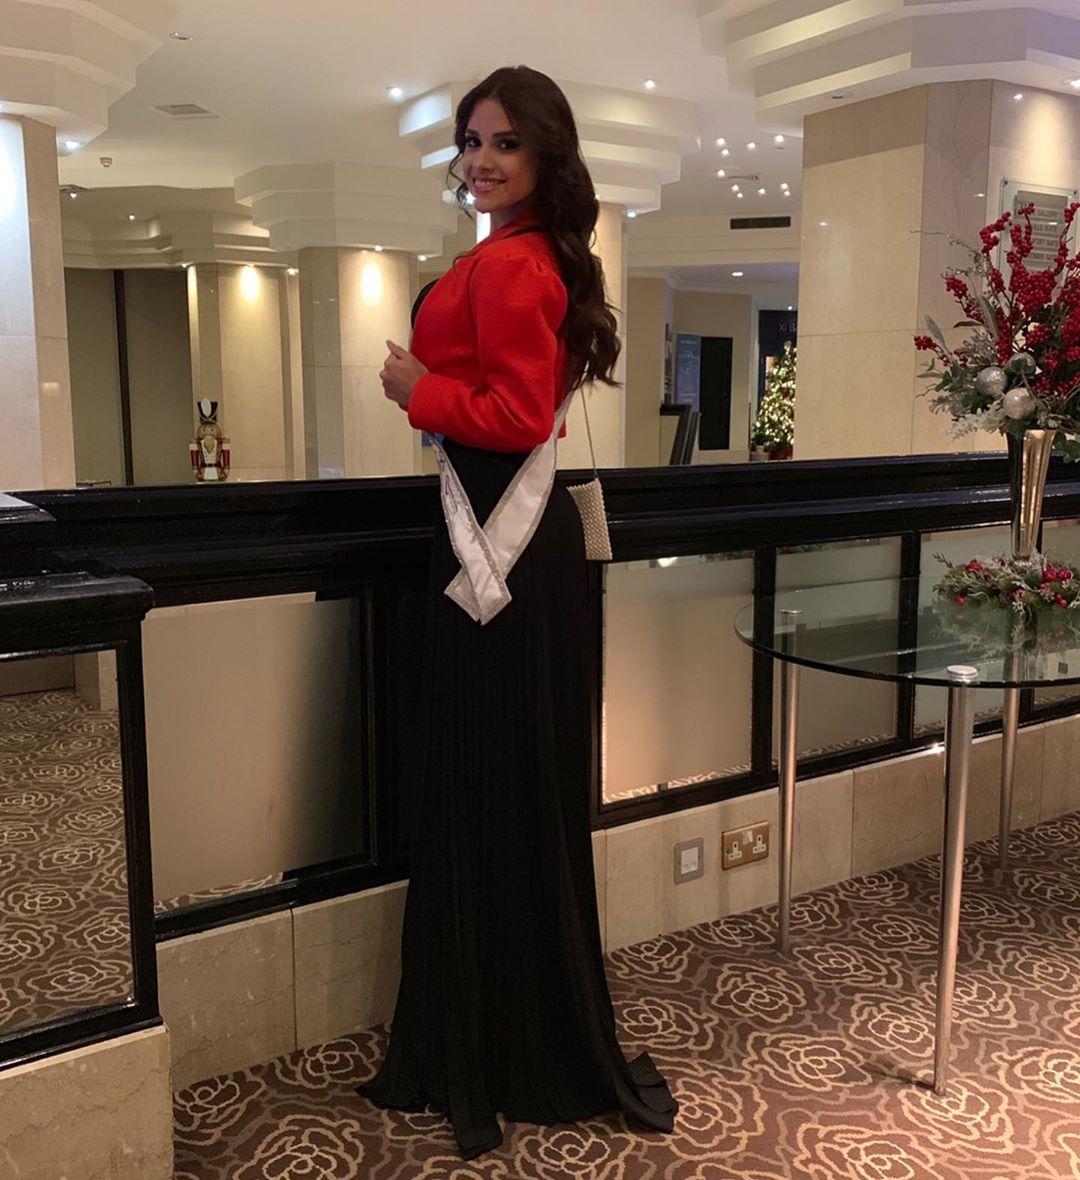 angella escudero, miss world peru 2019. - Página 5 75231113